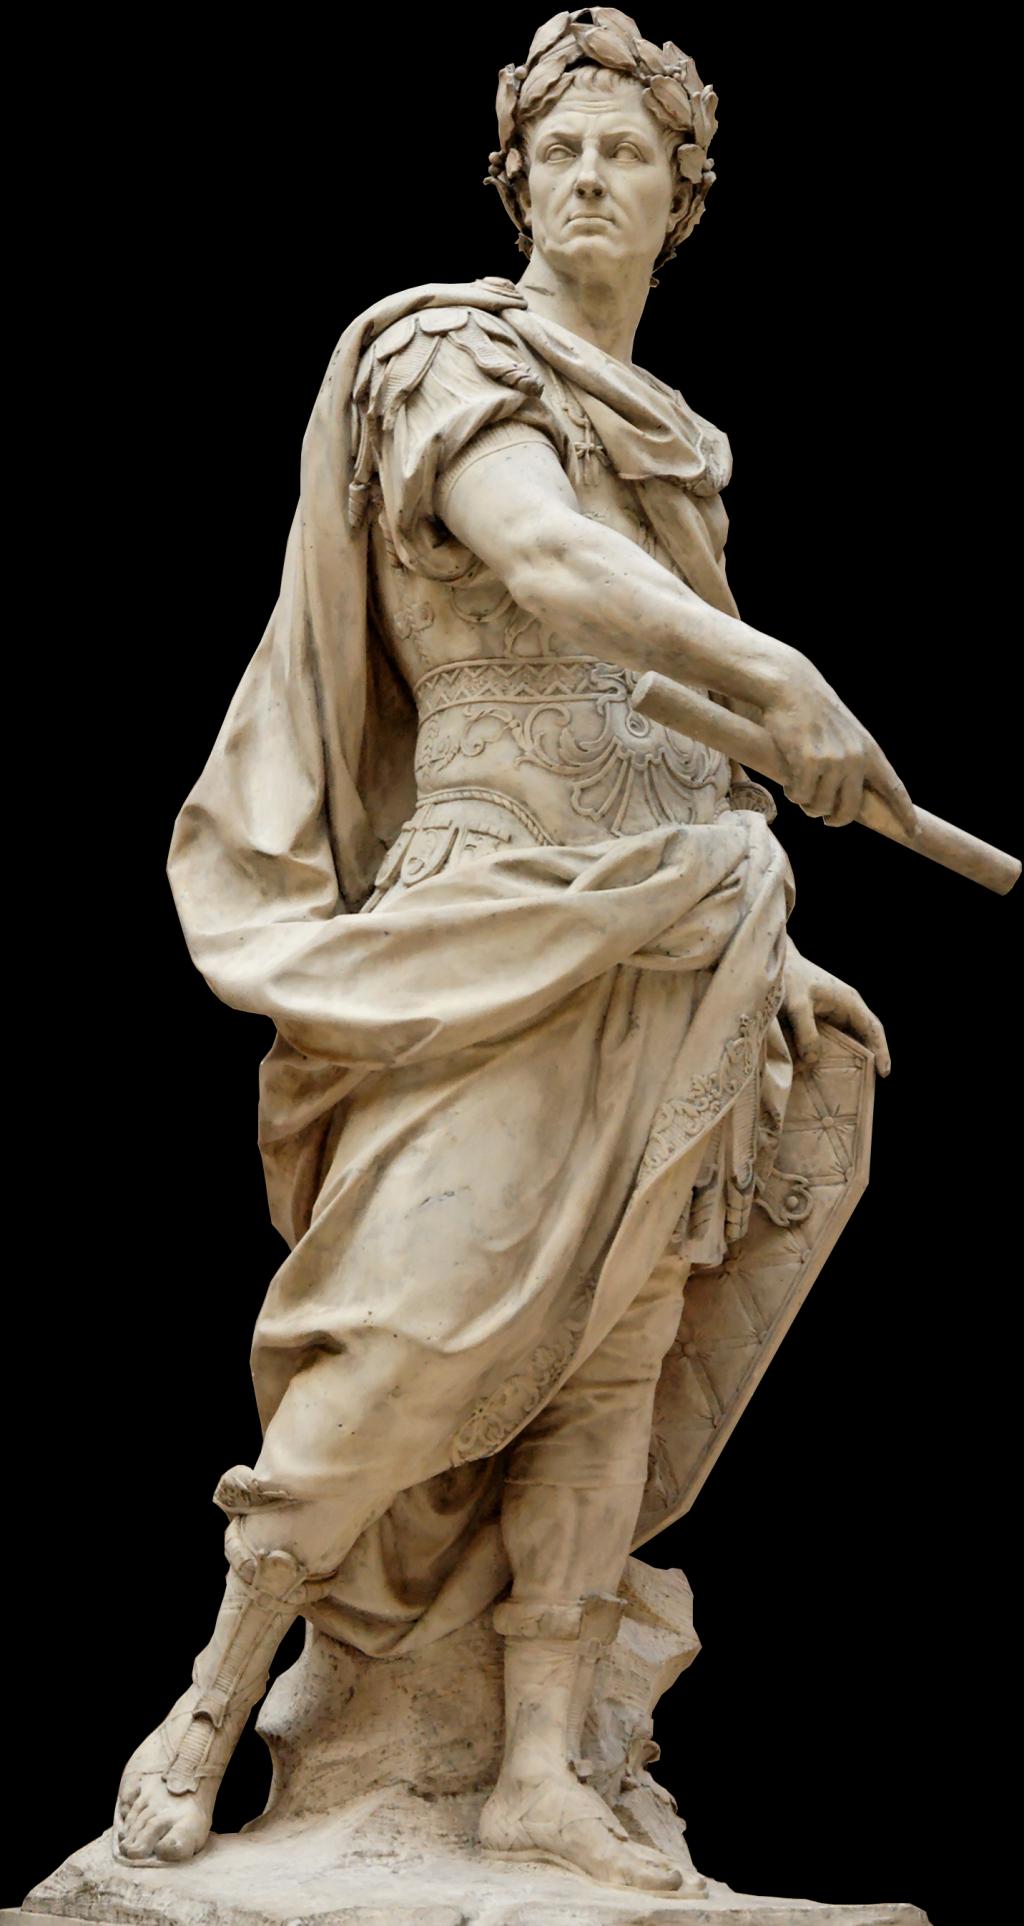 Sculpture of Julius Caesar by 17th century French sculptor Nicolas Coustou. - Julius Caesar PNG HD